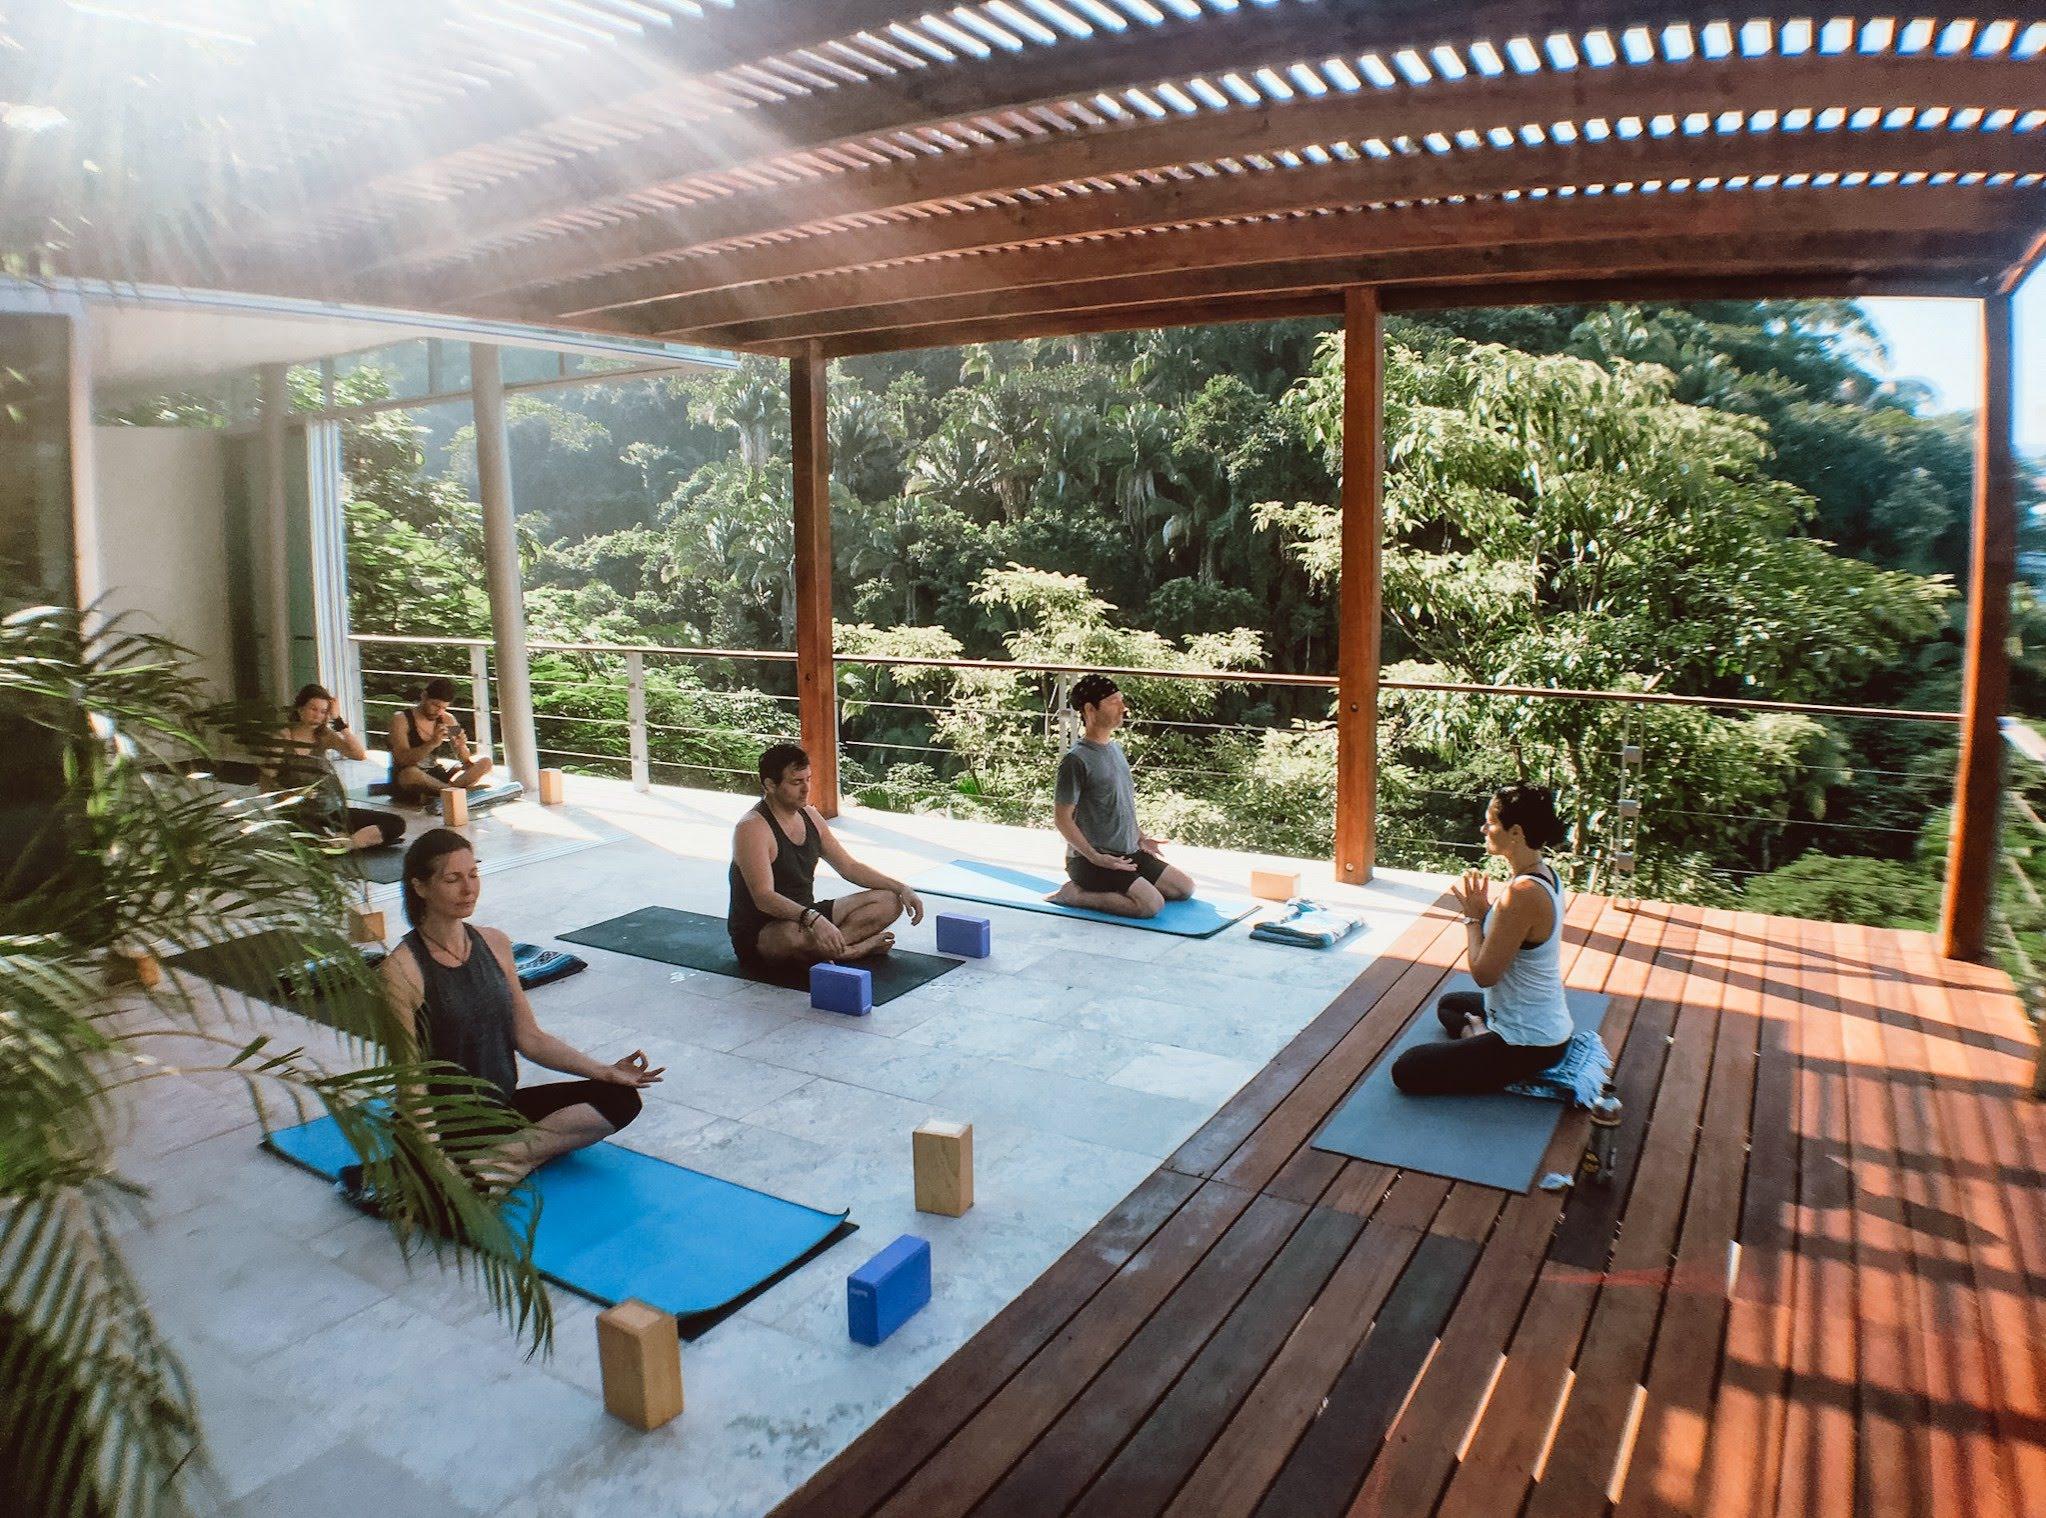 yoga al fresco - ocean and jungle views